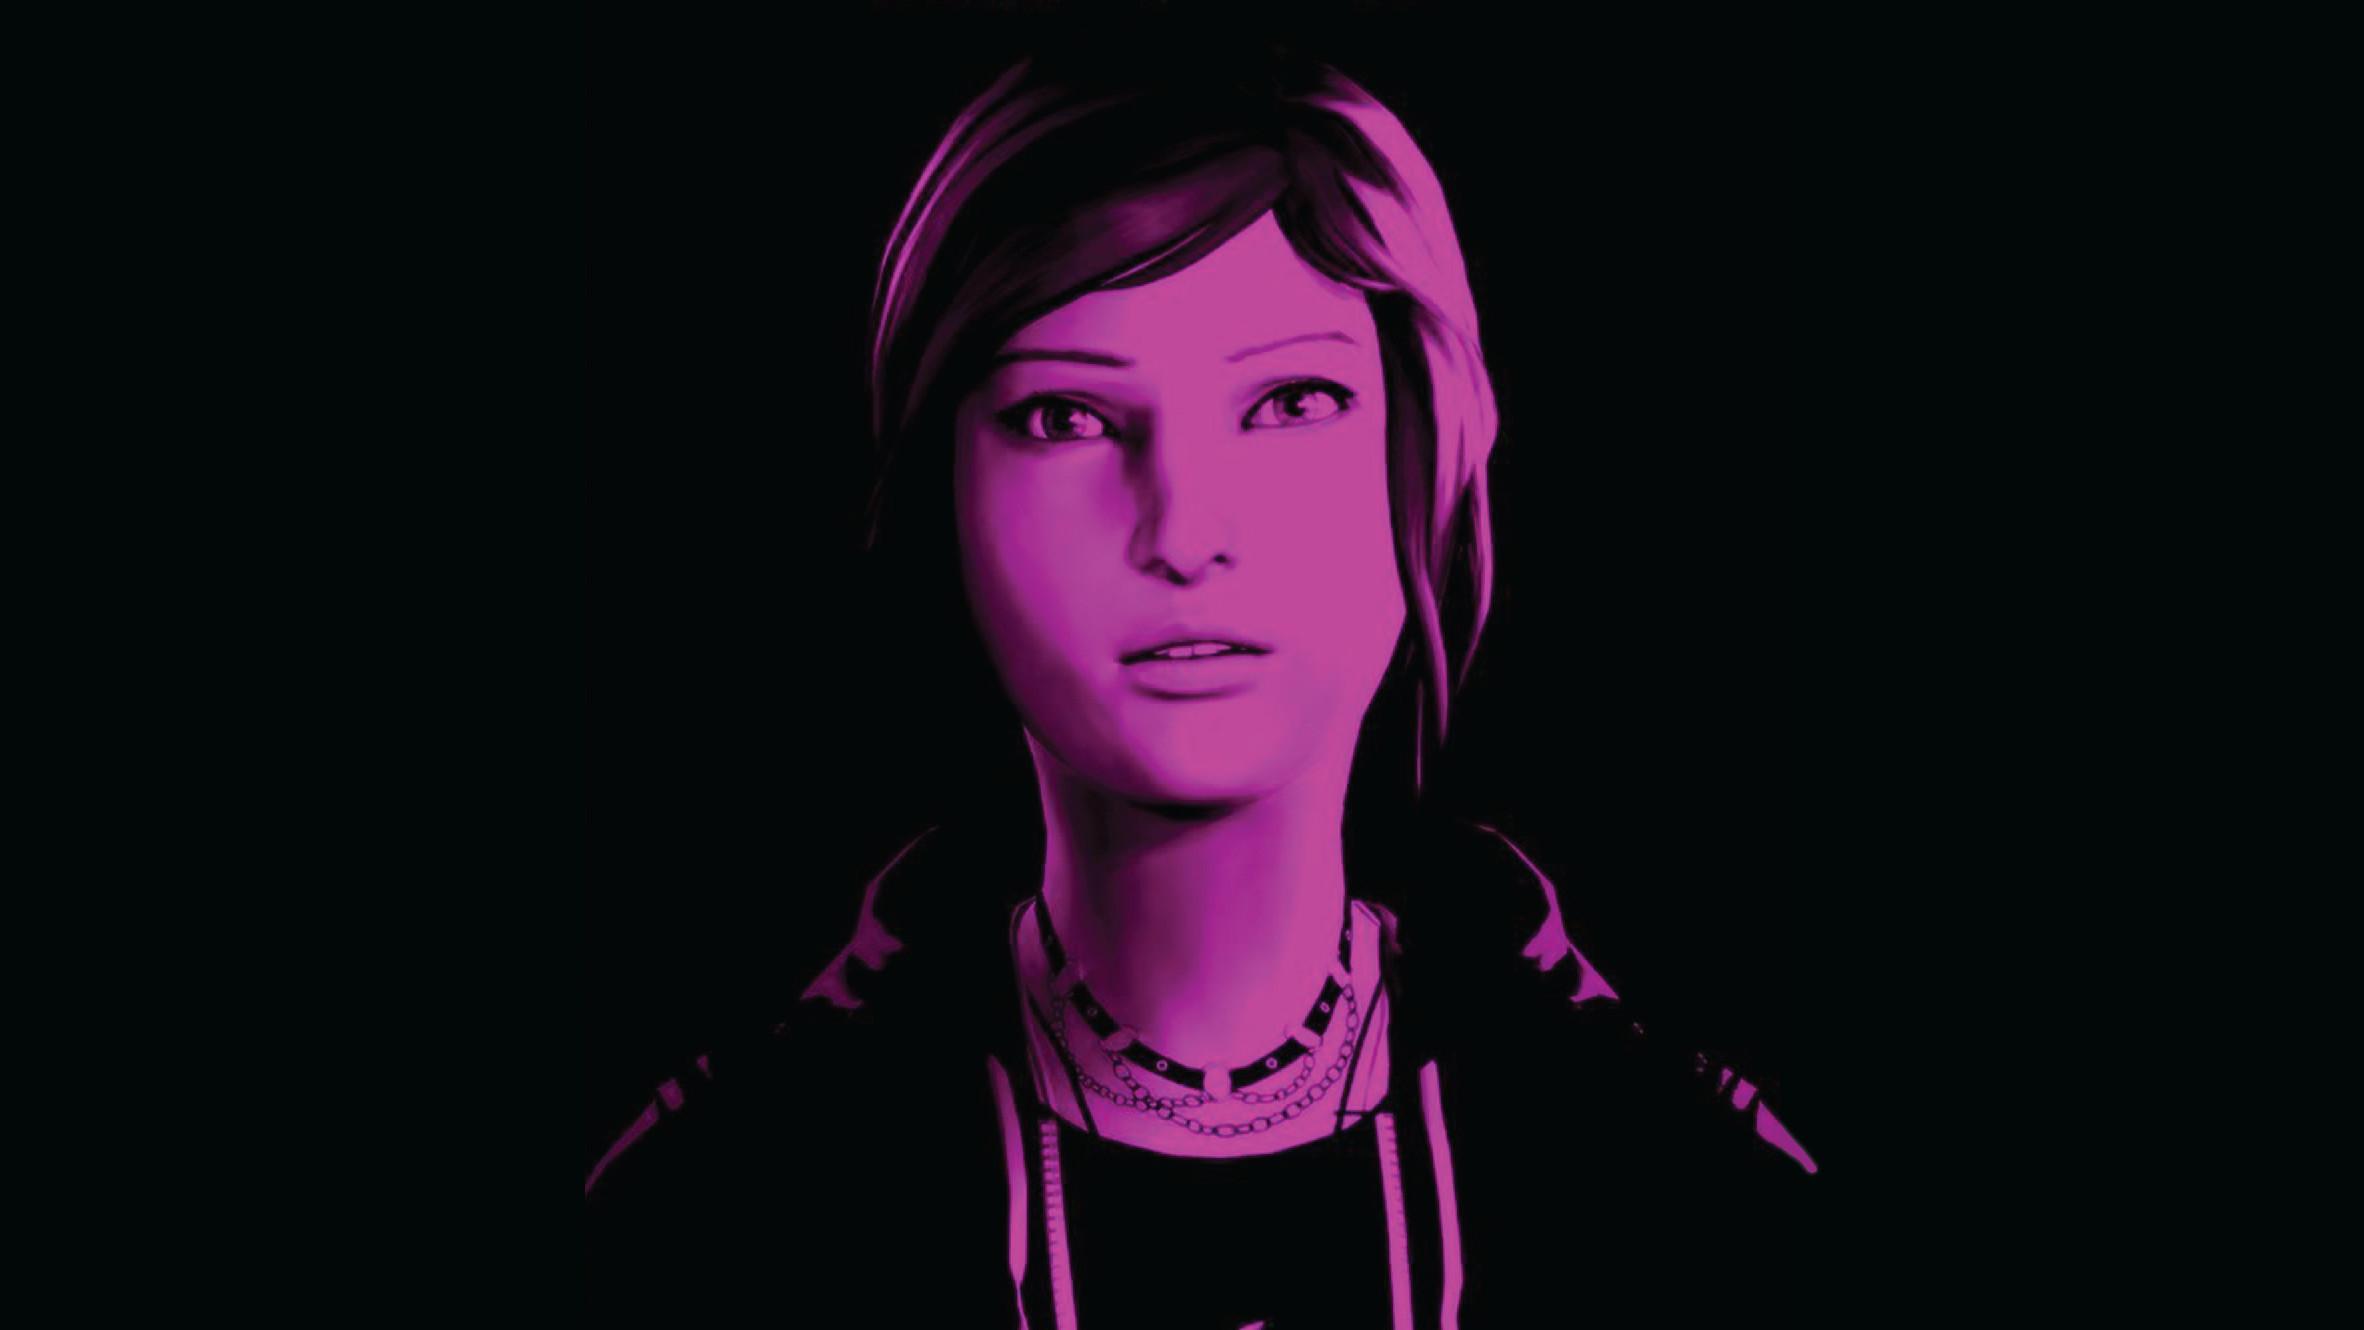 Res: 2364x1330, General  Chloe Price Life Is Strange Life is Strange Before the  Storm pink black